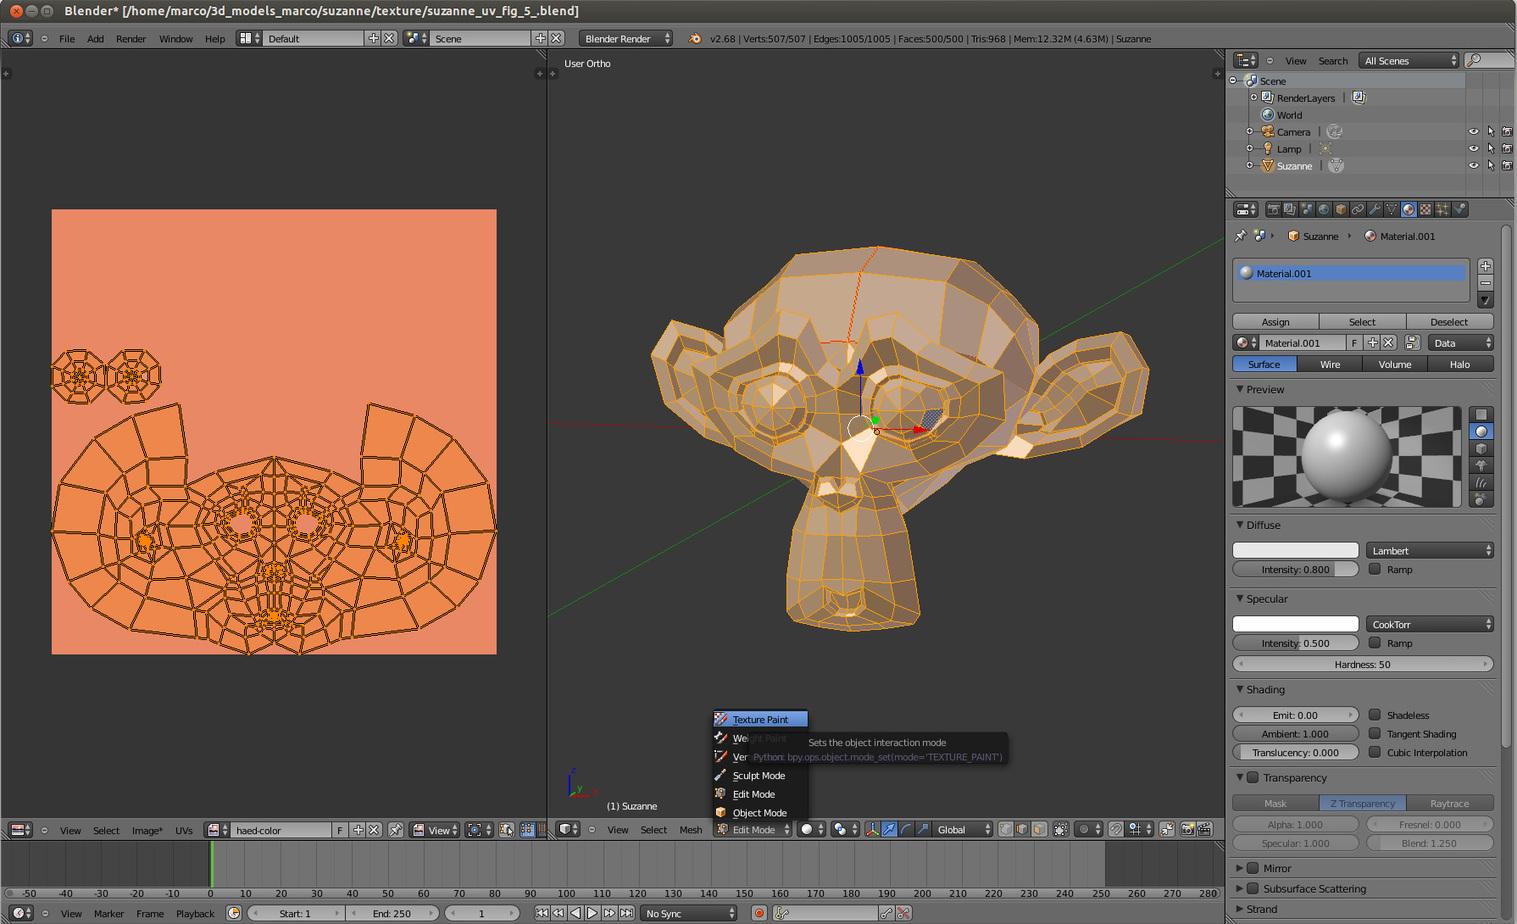 colorful patterns for 3D color printing in Blender